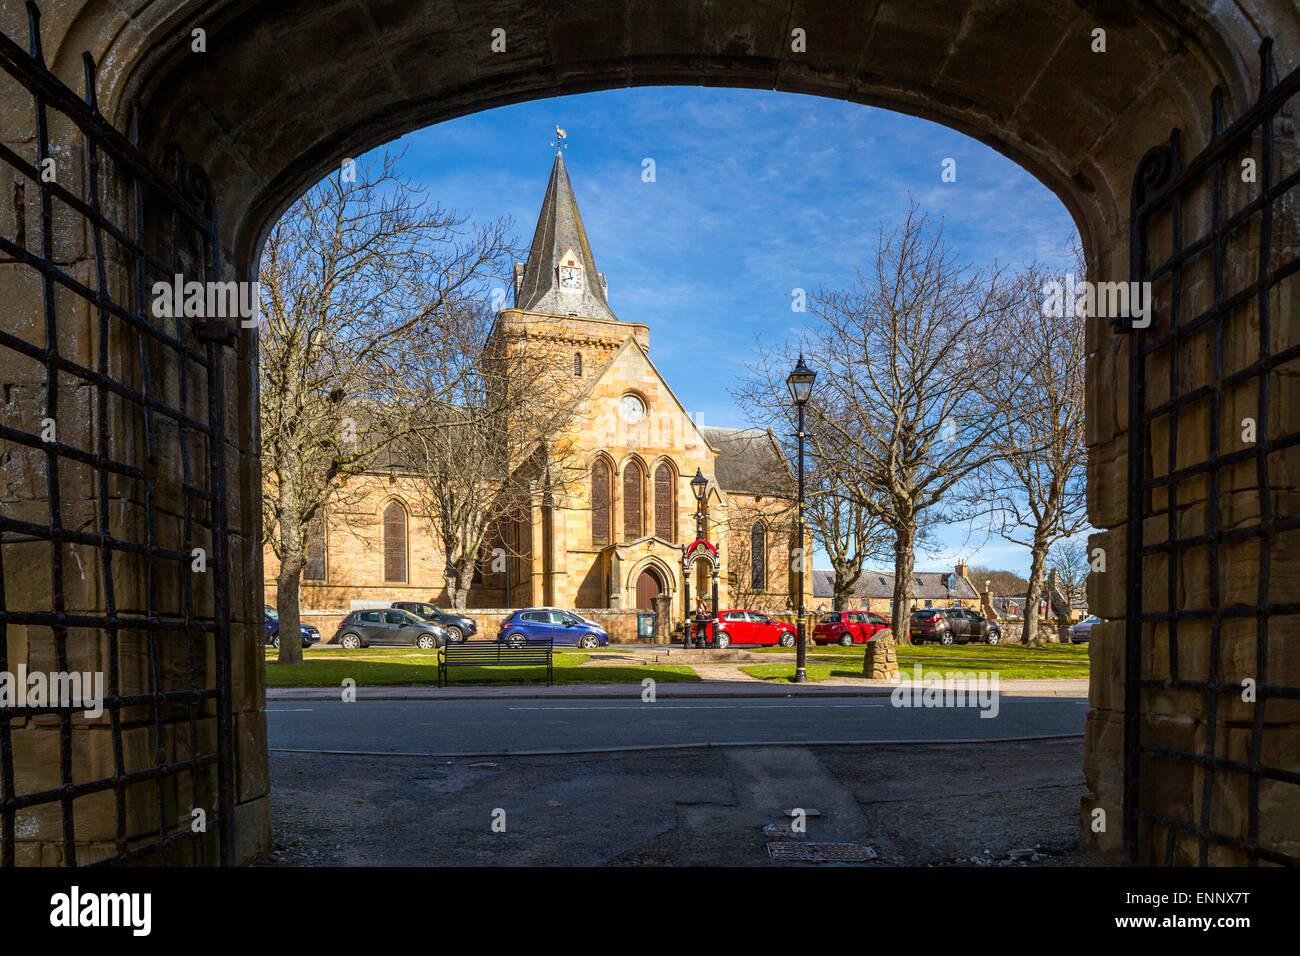 13th century Dornoch Cathedral, Sutherland, Highland, United Kingdom, Scotland, Europe. Stock Photo